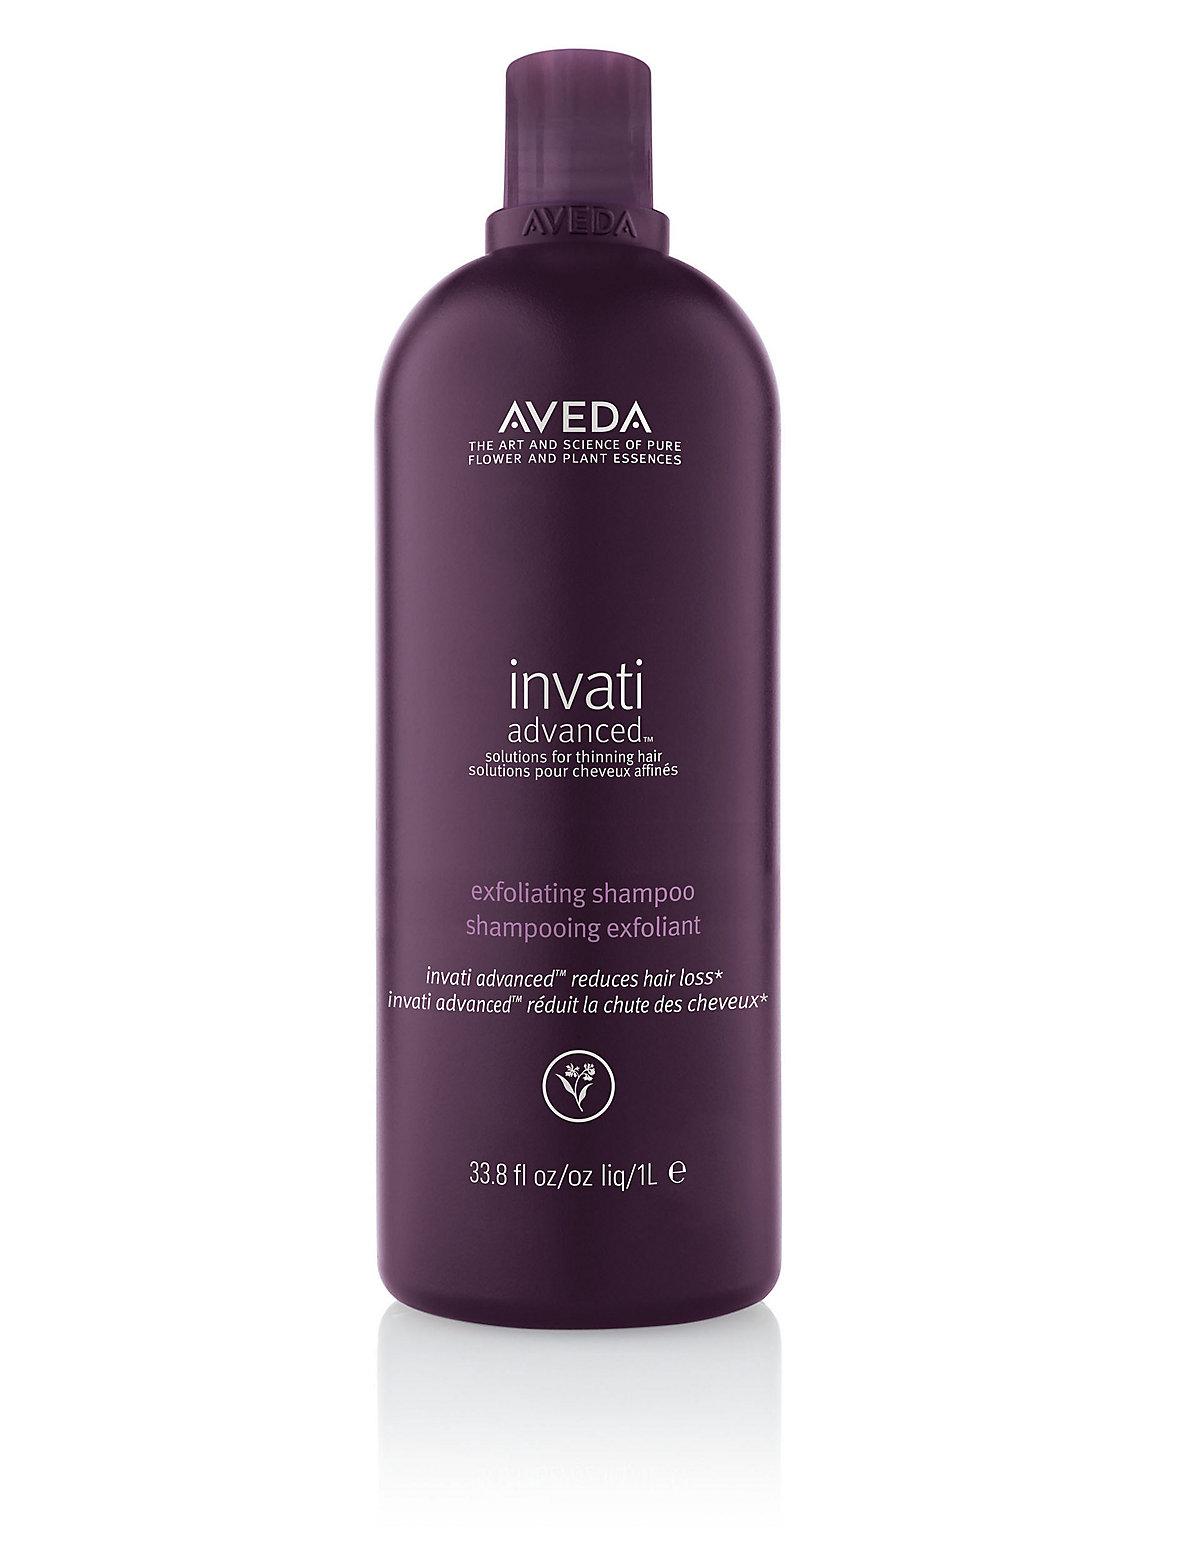 AVEDA 1 Litre Exfoliating Shampoo - *Save 25% per ml